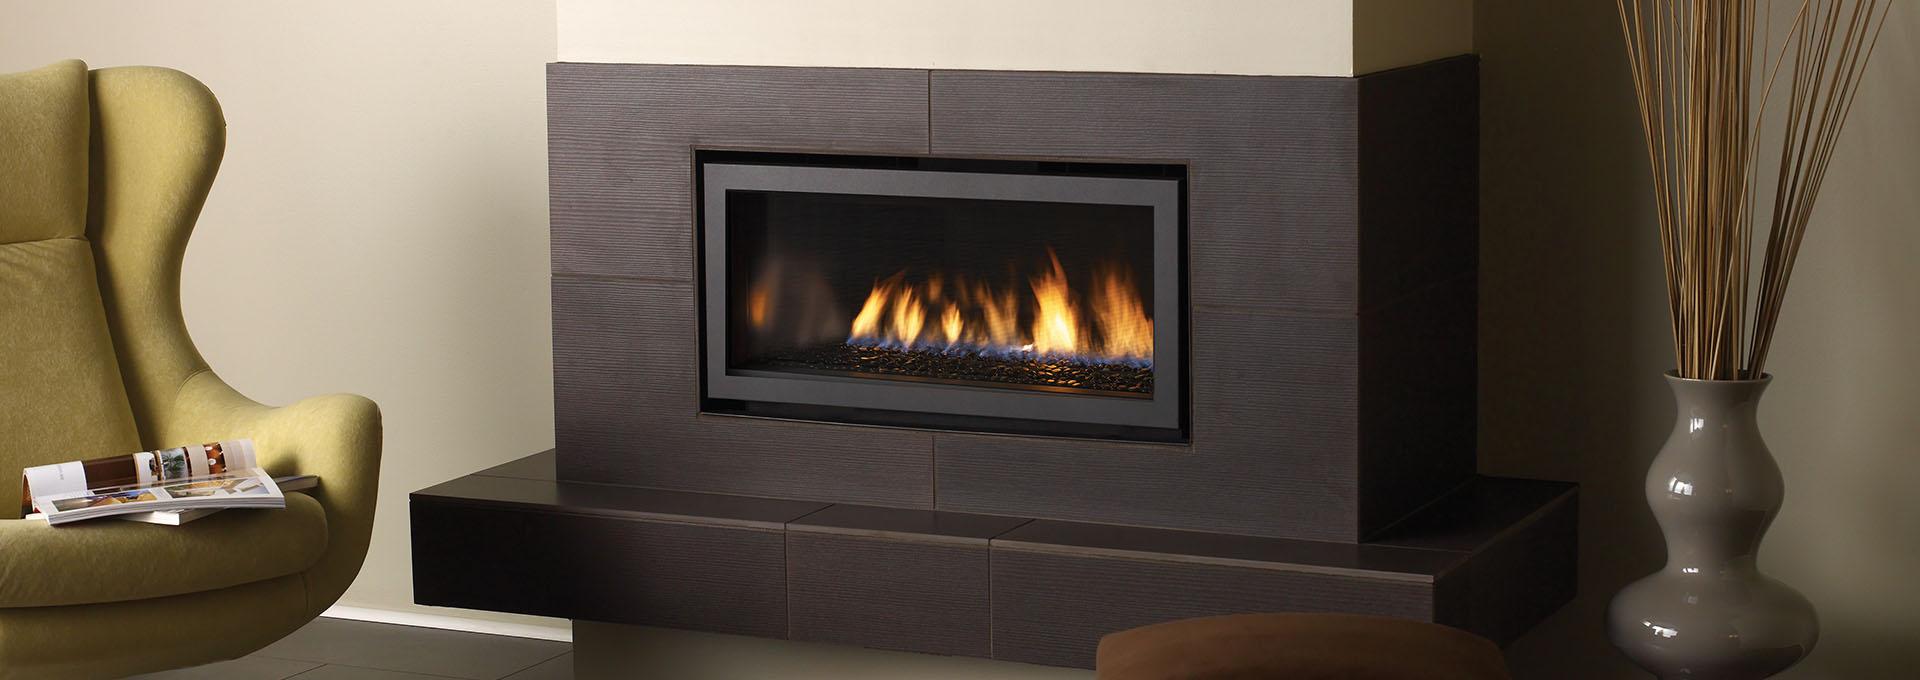 Regency Horizon 30 Direct Vent Gas Fireplace Colorado Hearth